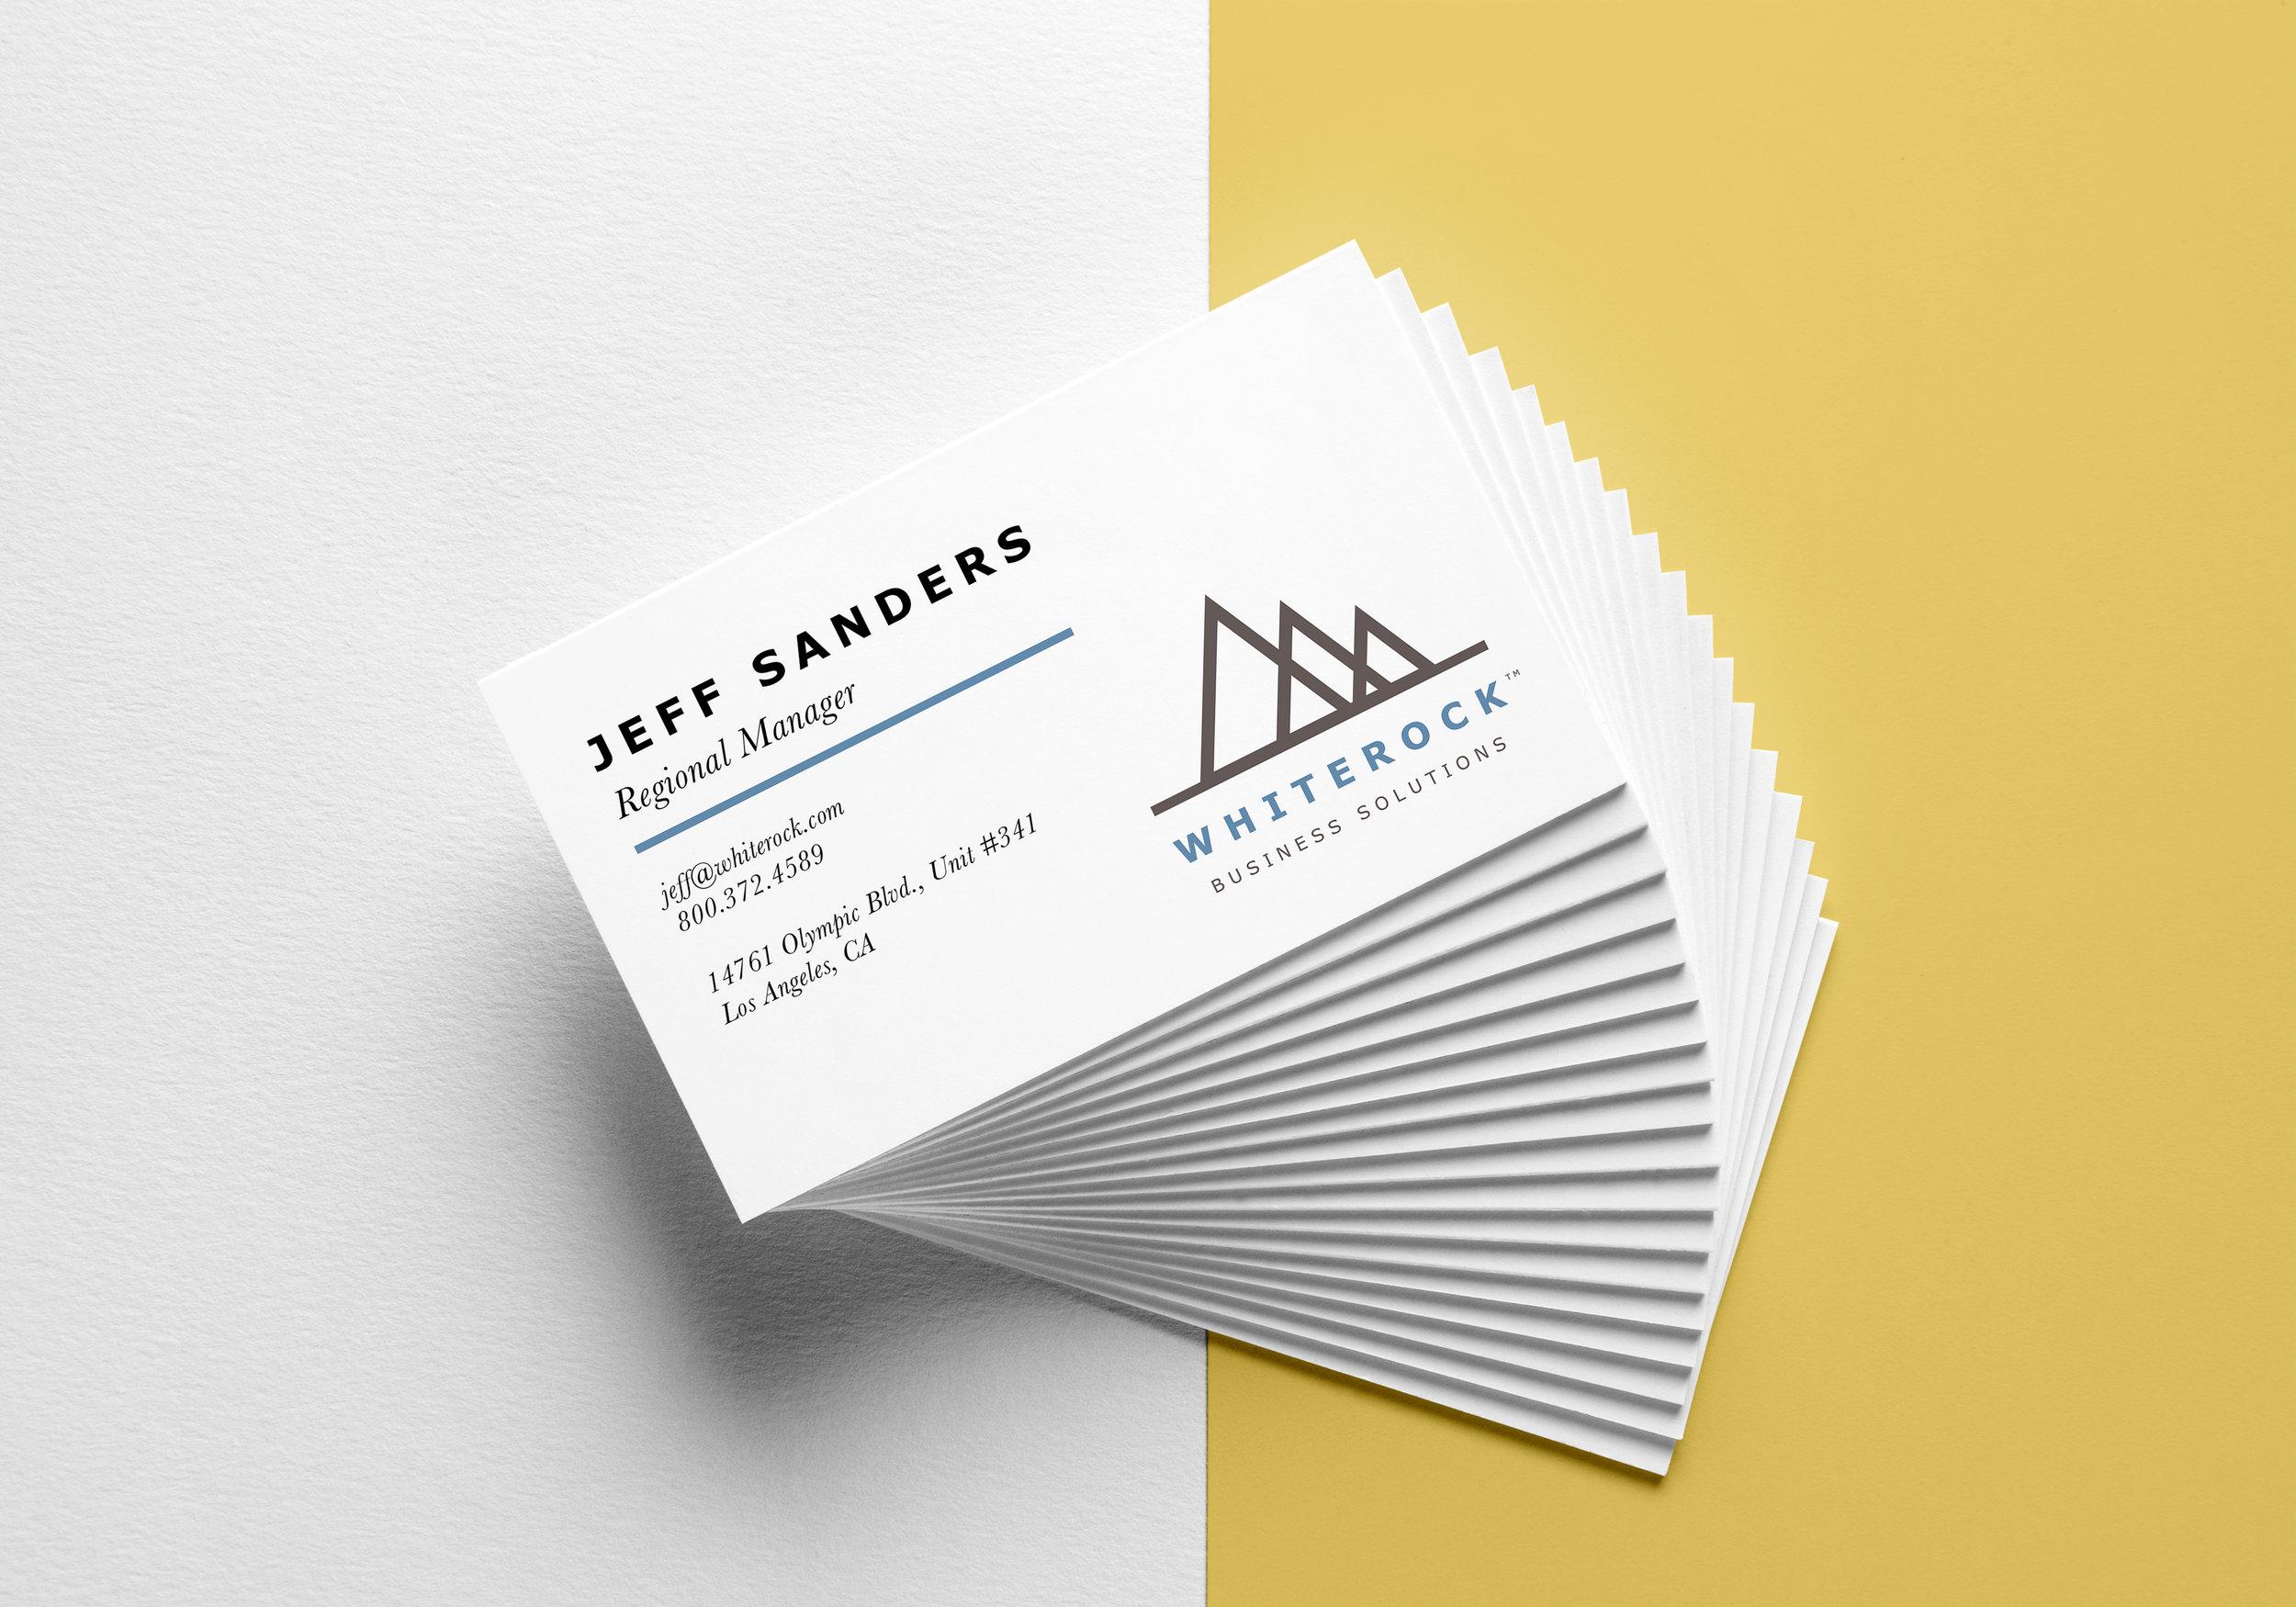 Whiterock business card.jpg